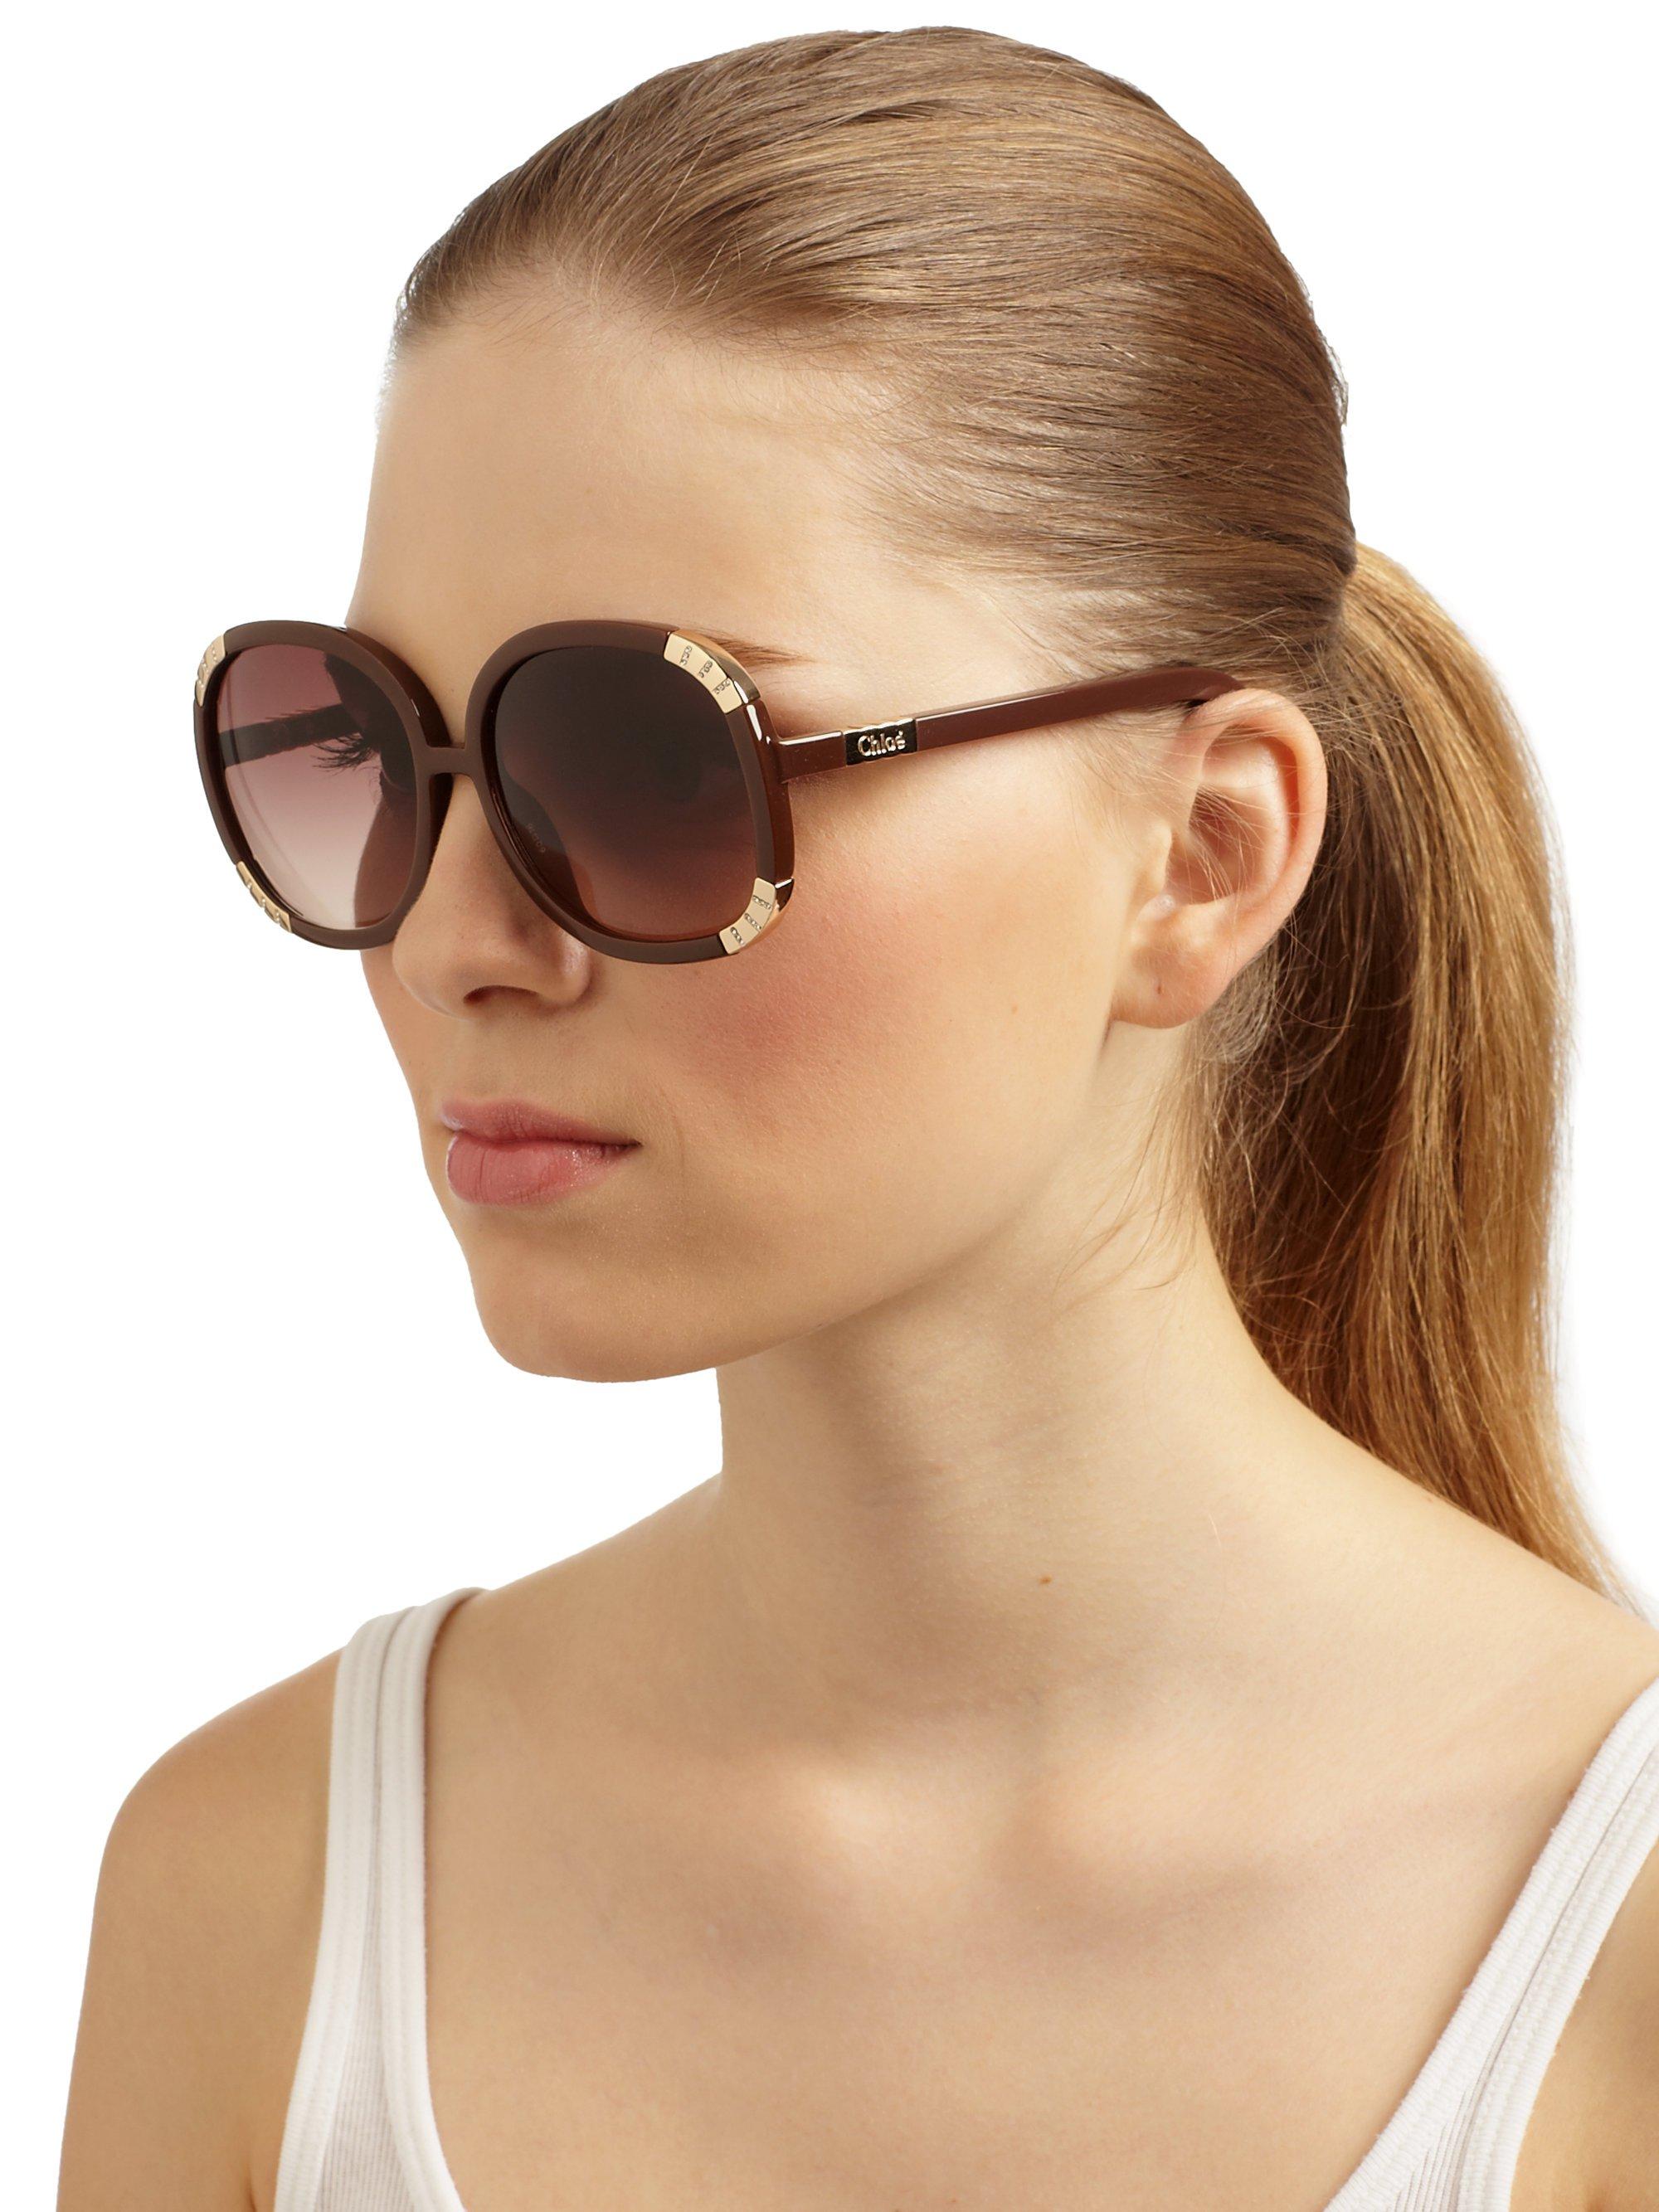 d82d0b7dbd8 Lyst - Chloé Oversized Round Acetate Rhinestone Sunglasses in Brown